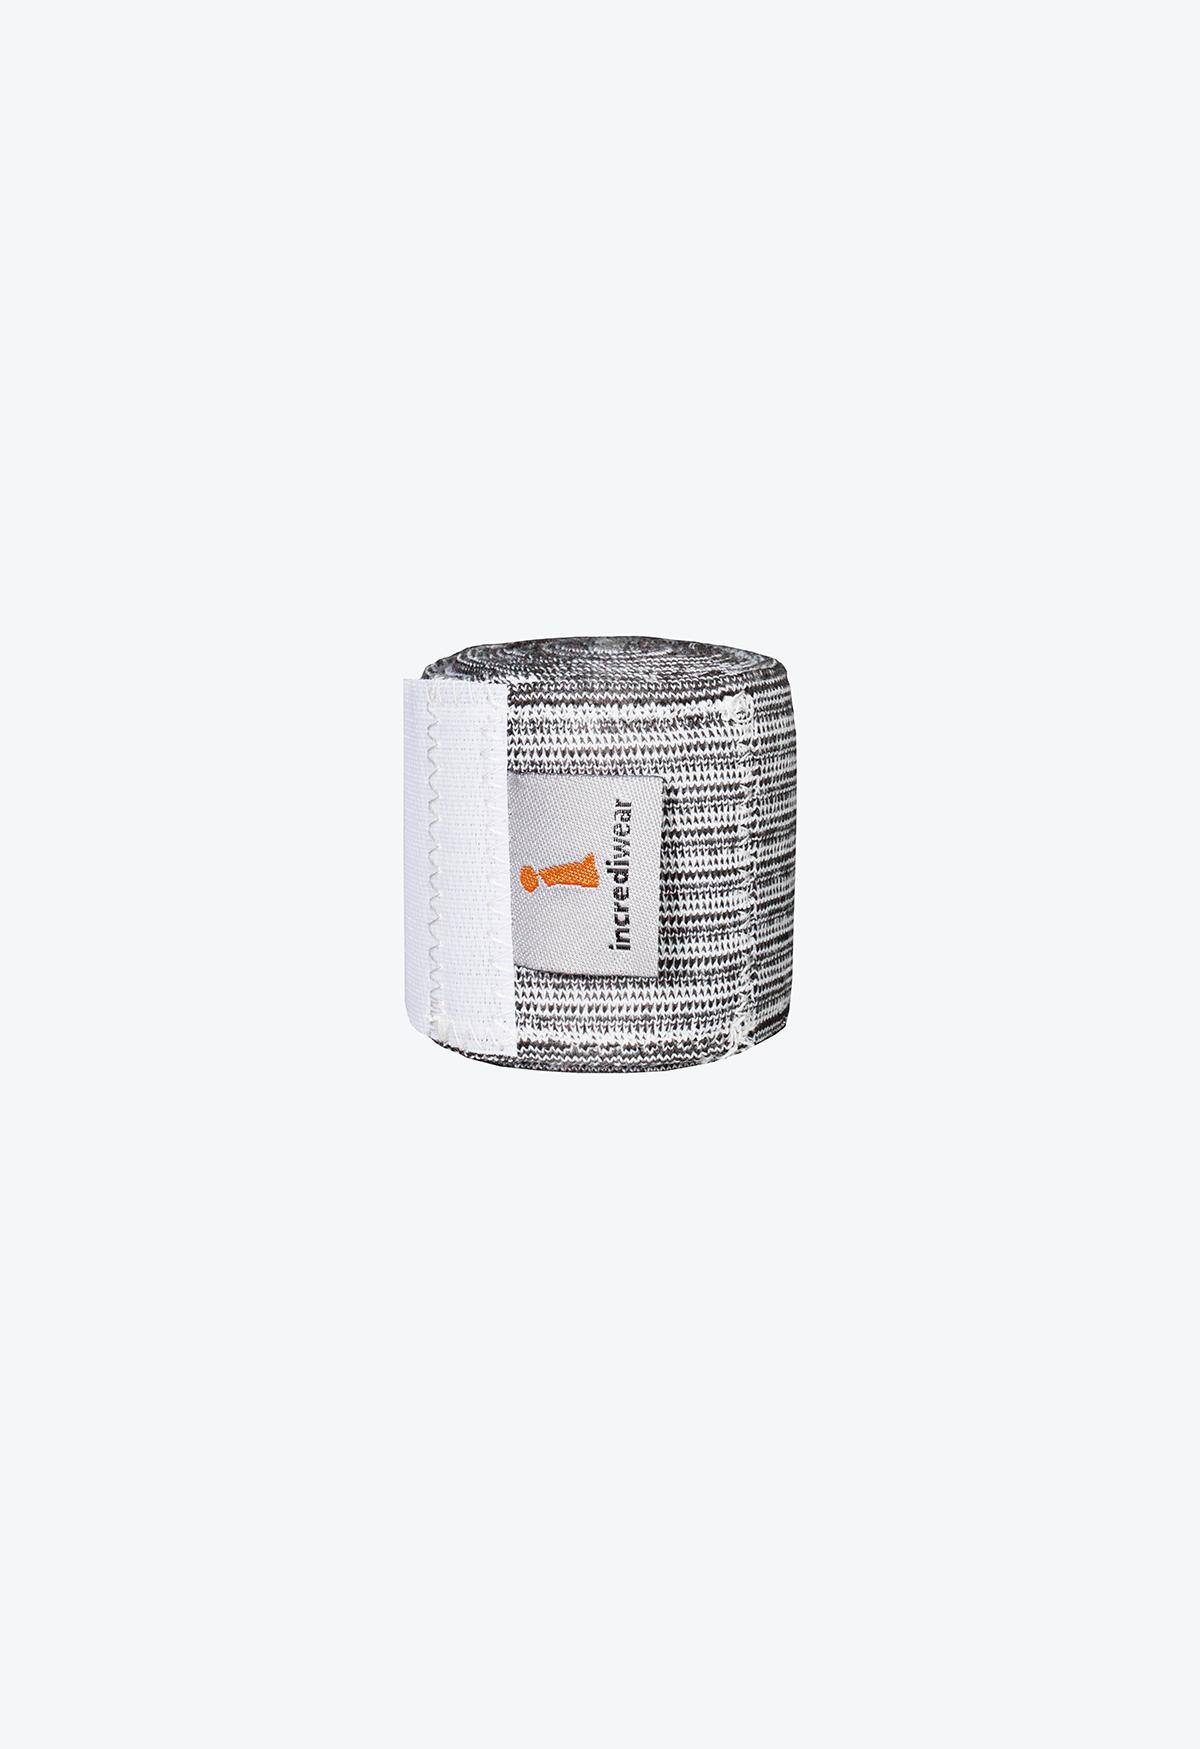 2inch_Bandage Wrap_Front